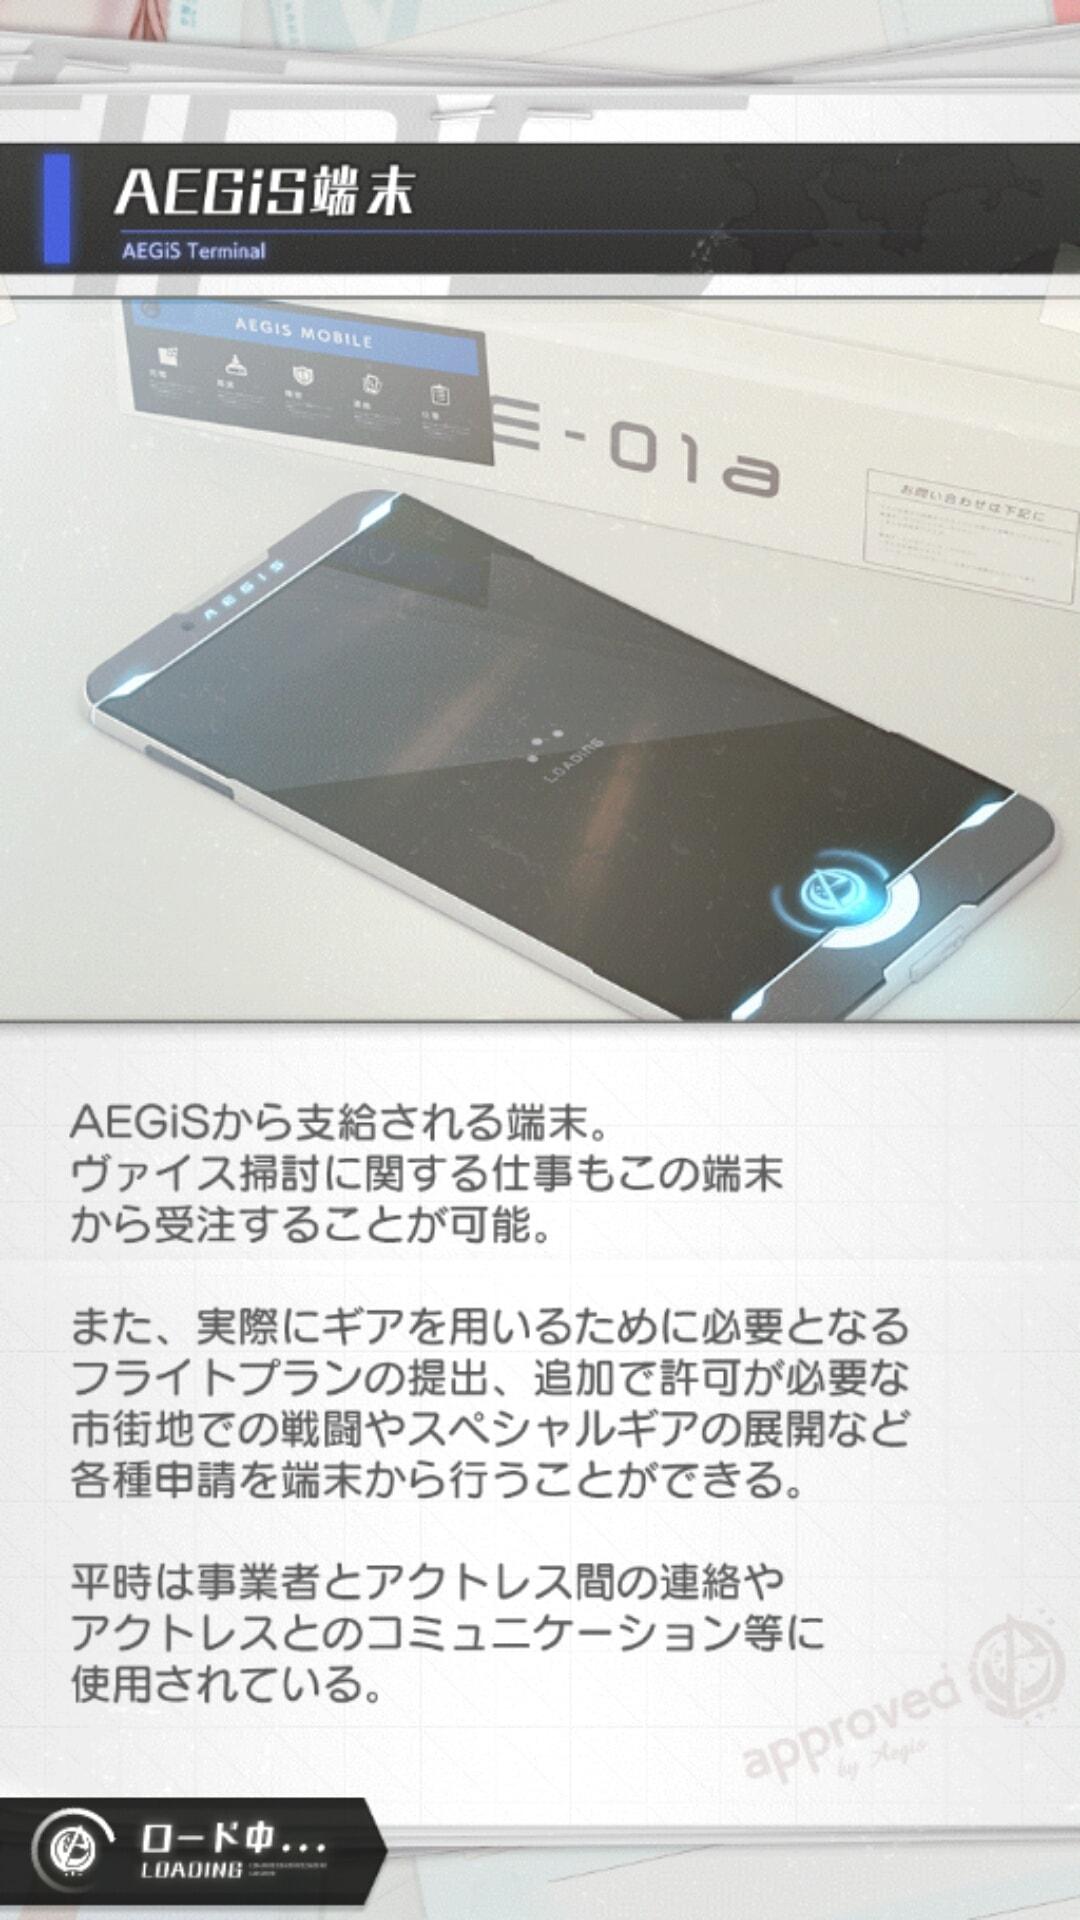 AEGiS端末.jpg